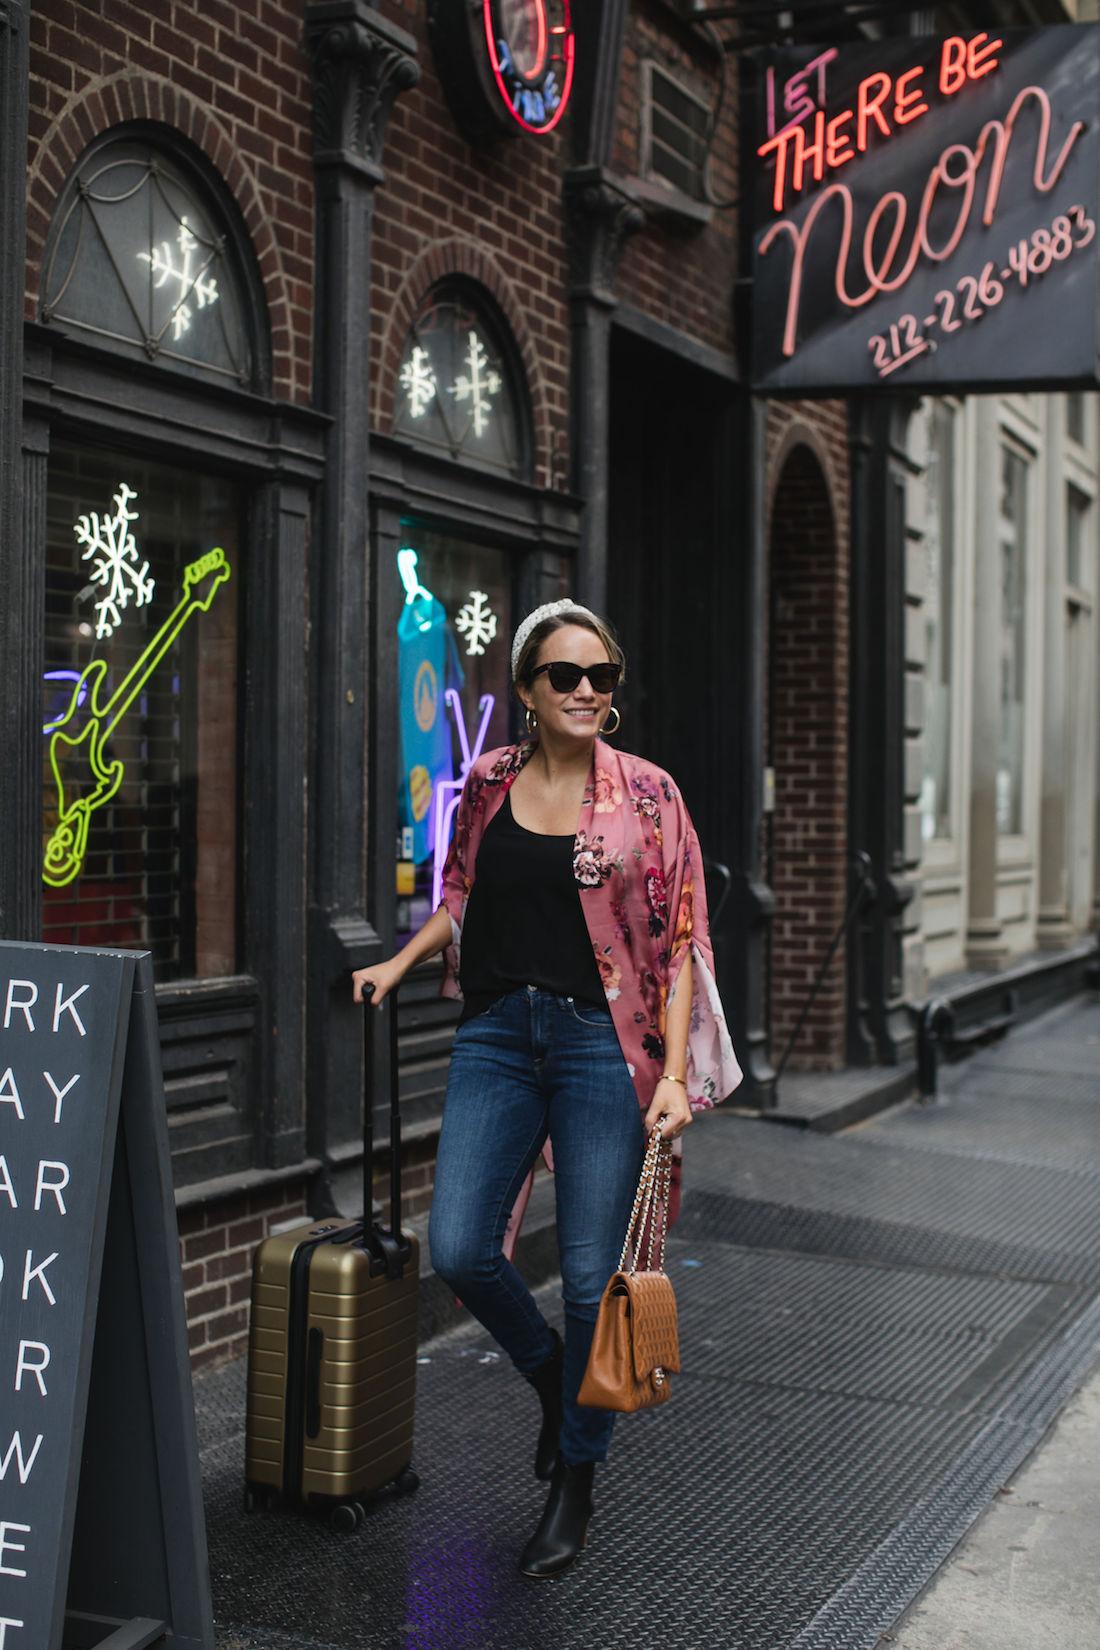 Look 1 Details: Silk Kimono (exact) // Eileen Fisher Silk Camisole // Good American Jeans (similar)// Lele Sadoughi Headband(love this one too!) // Gold Hoops (similar) //Sunglasses (similar) // Boots (similar) // Monica Vinader Bracelet // Similar Suitcase